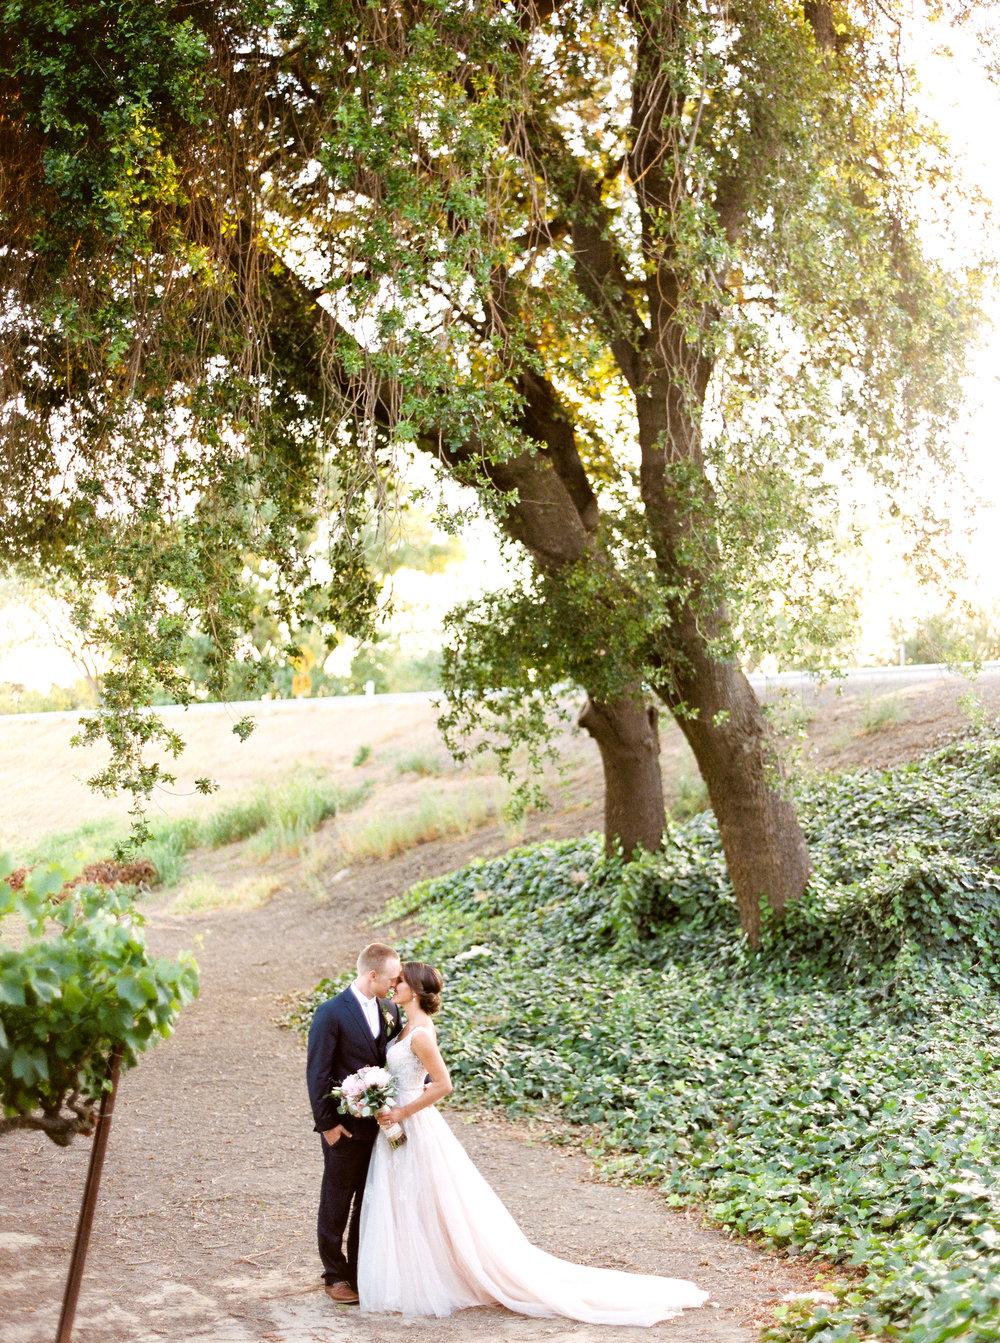 blush-wedding-at-scribner-bend-vineyards-sacramento-california-1-5.jpg